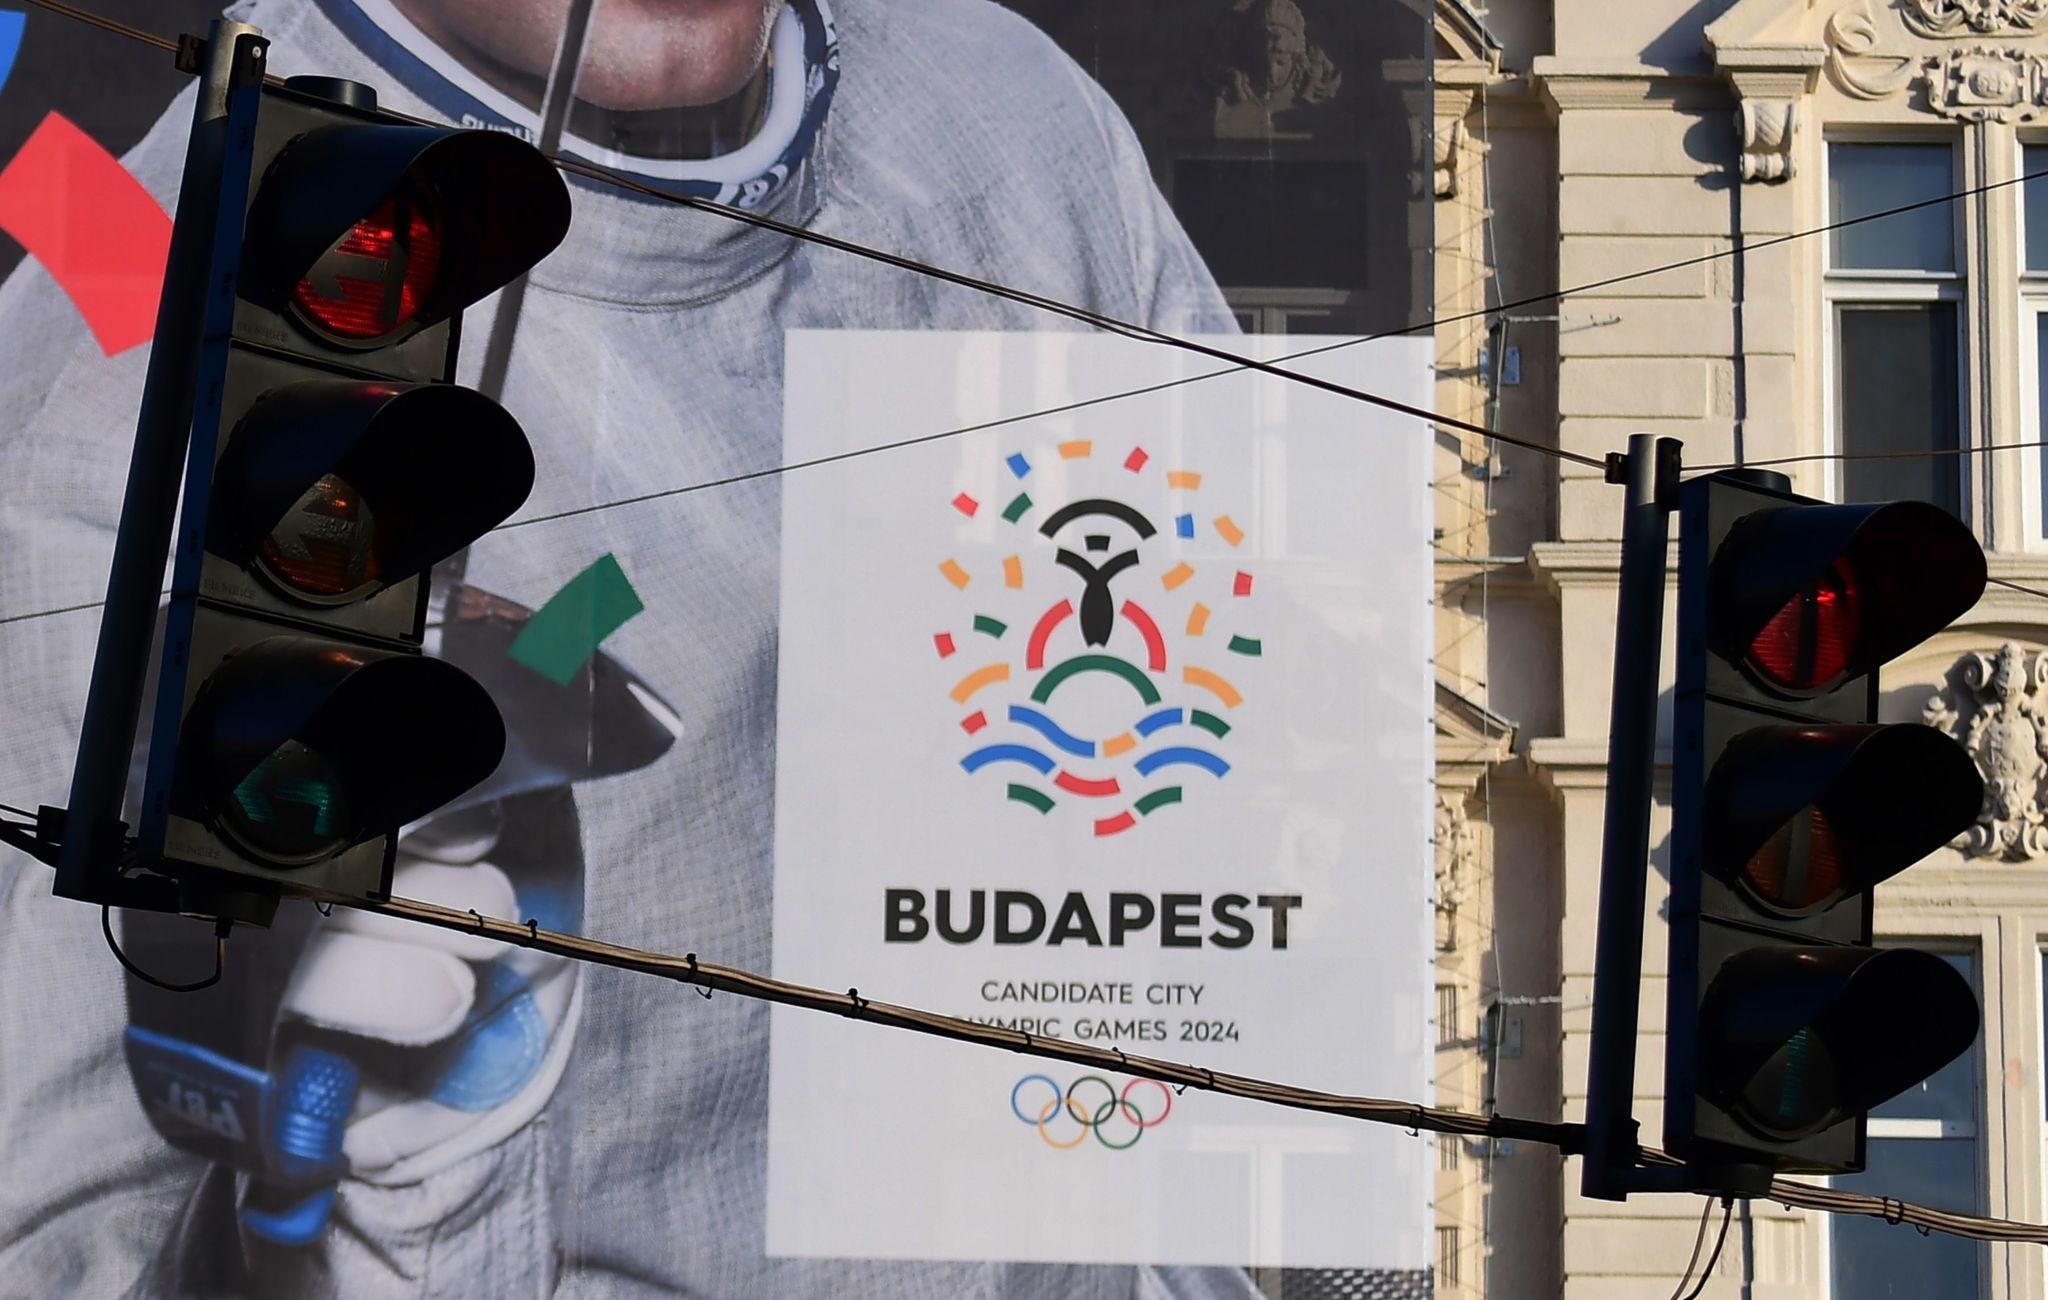 ct-budapest-withdraws-2024-olympics-20170222.jpg